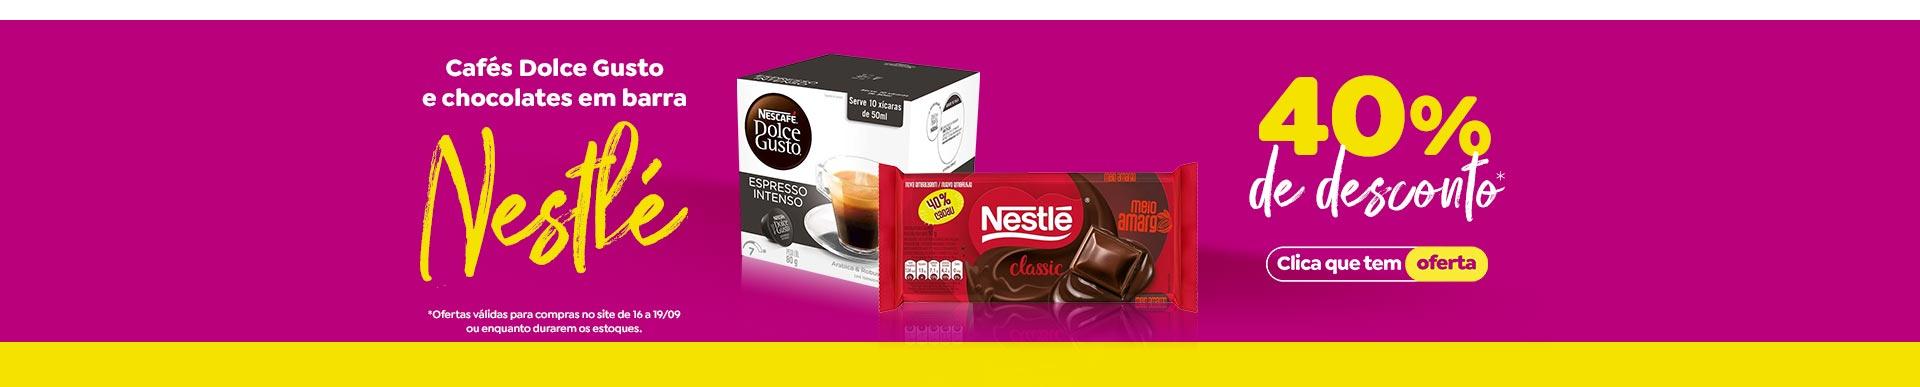 trade_2021-09-16a09-19_perene_nestle_nescafe-chocolate-barra-40off